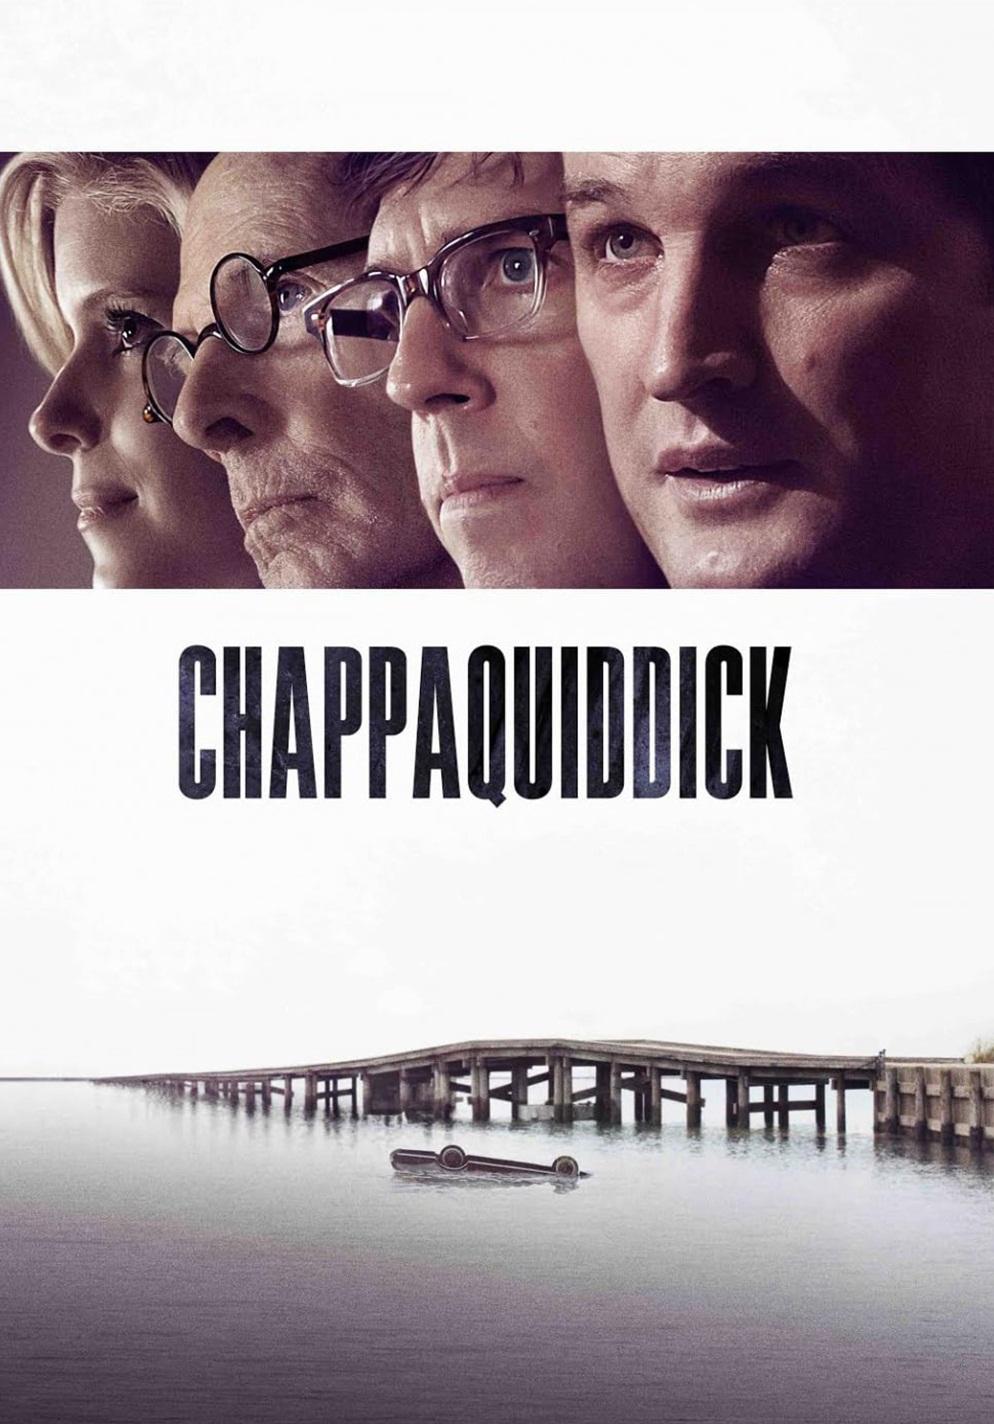 Chappaquiddick [2017] [DVDR] [NTSC] [Subtitulado]